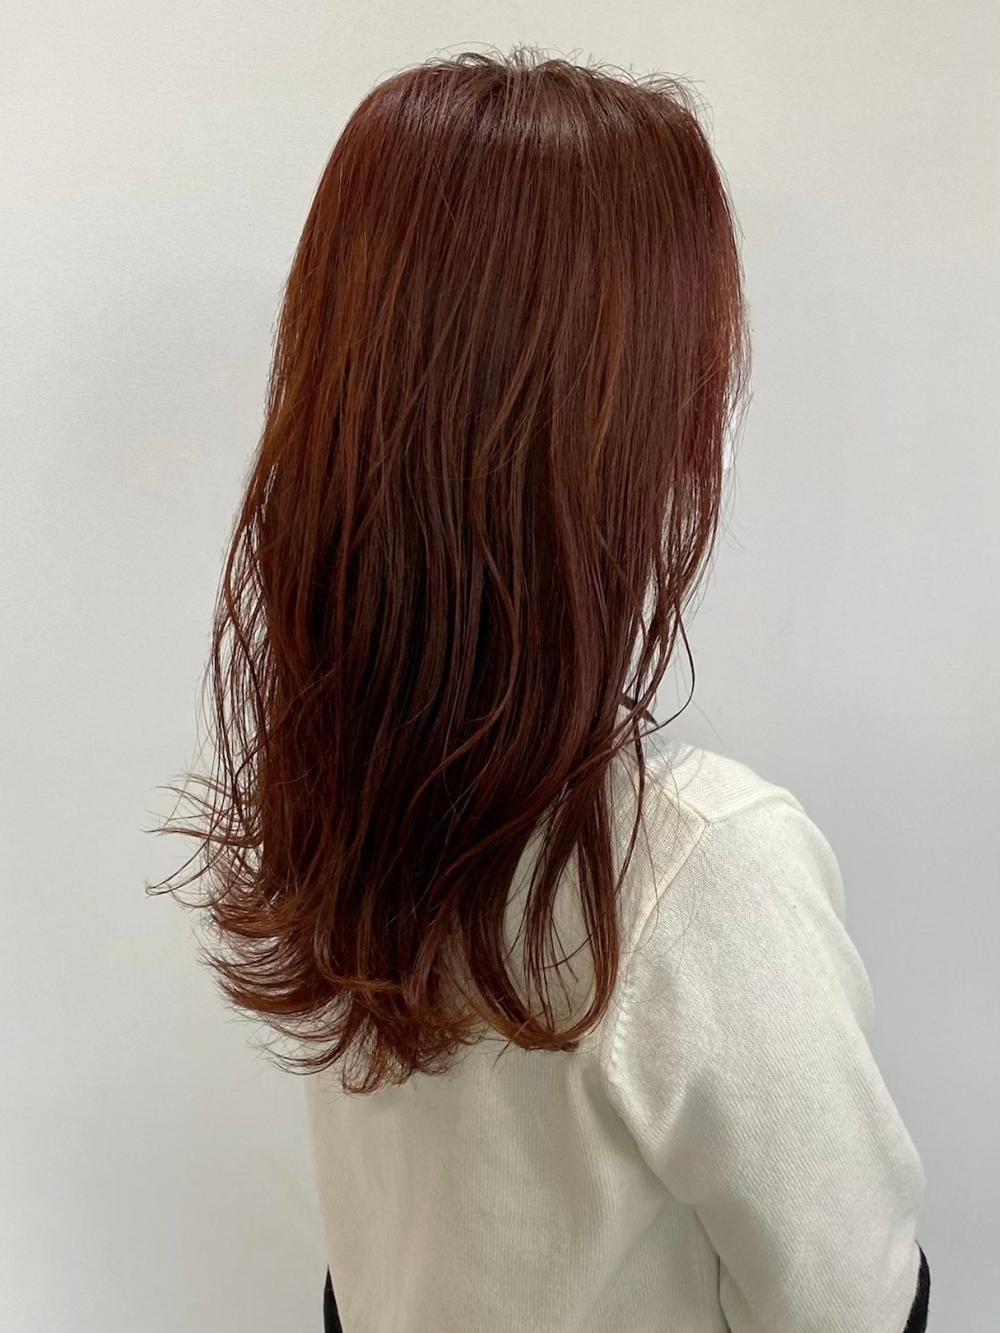 【feliceMICHI間嶋健司】チェリーブラウンカラー